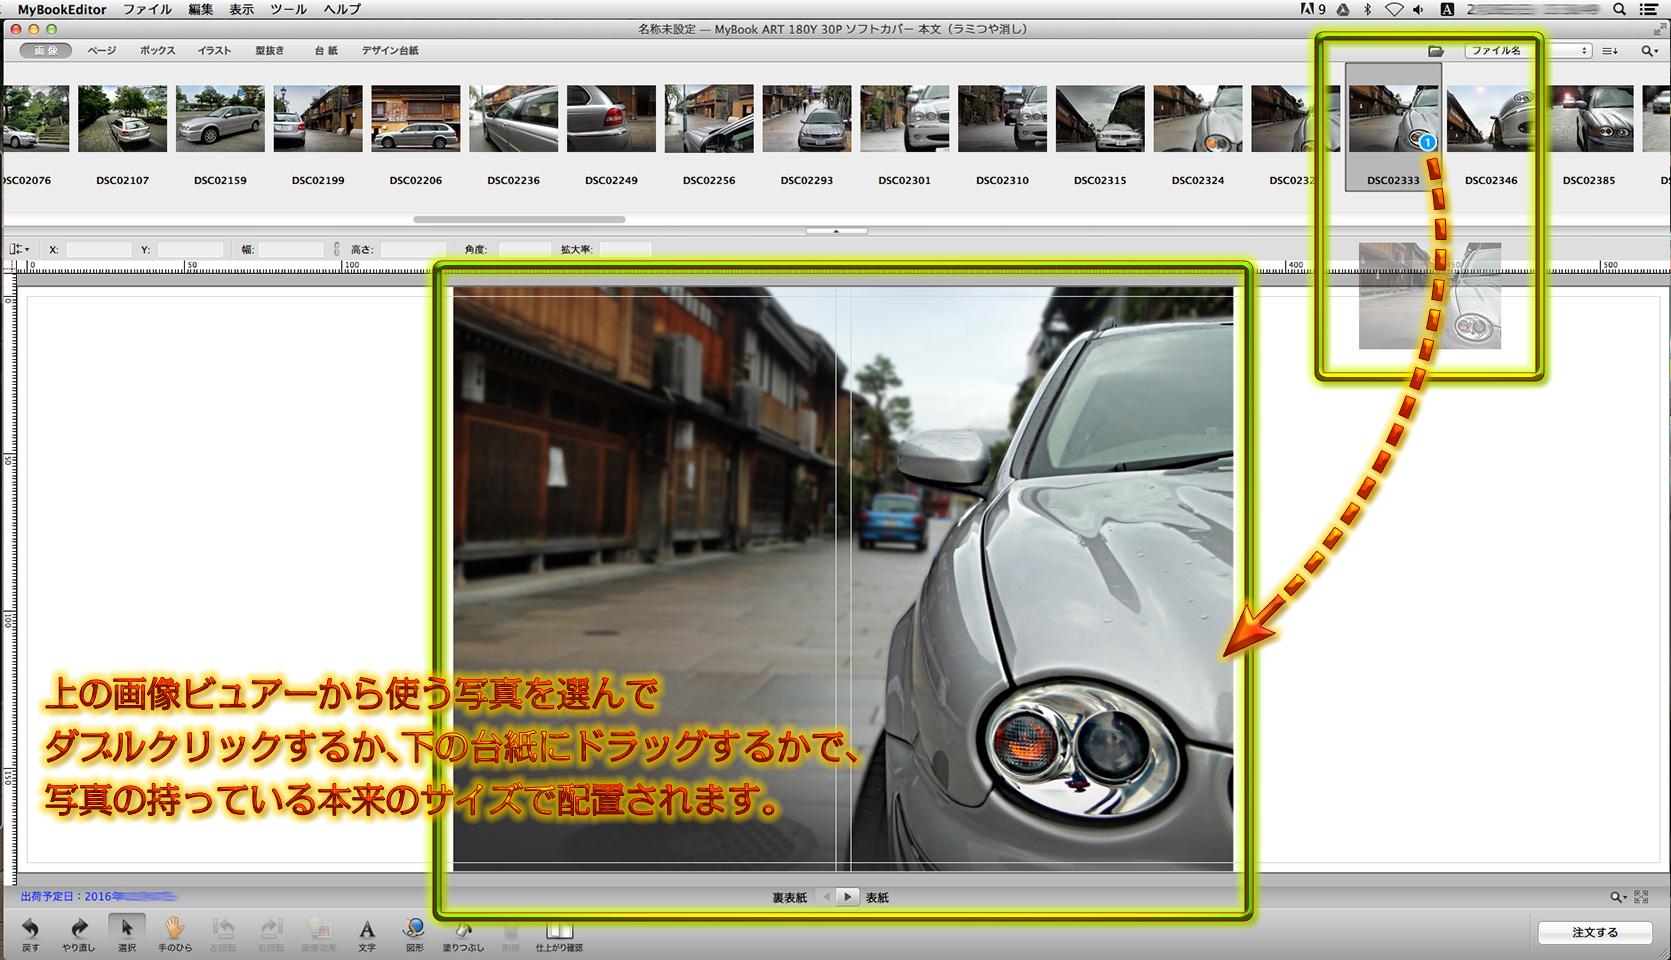 http://moritetsu.info/car/img/mb040-2016-02-28-15-38-49.jpg